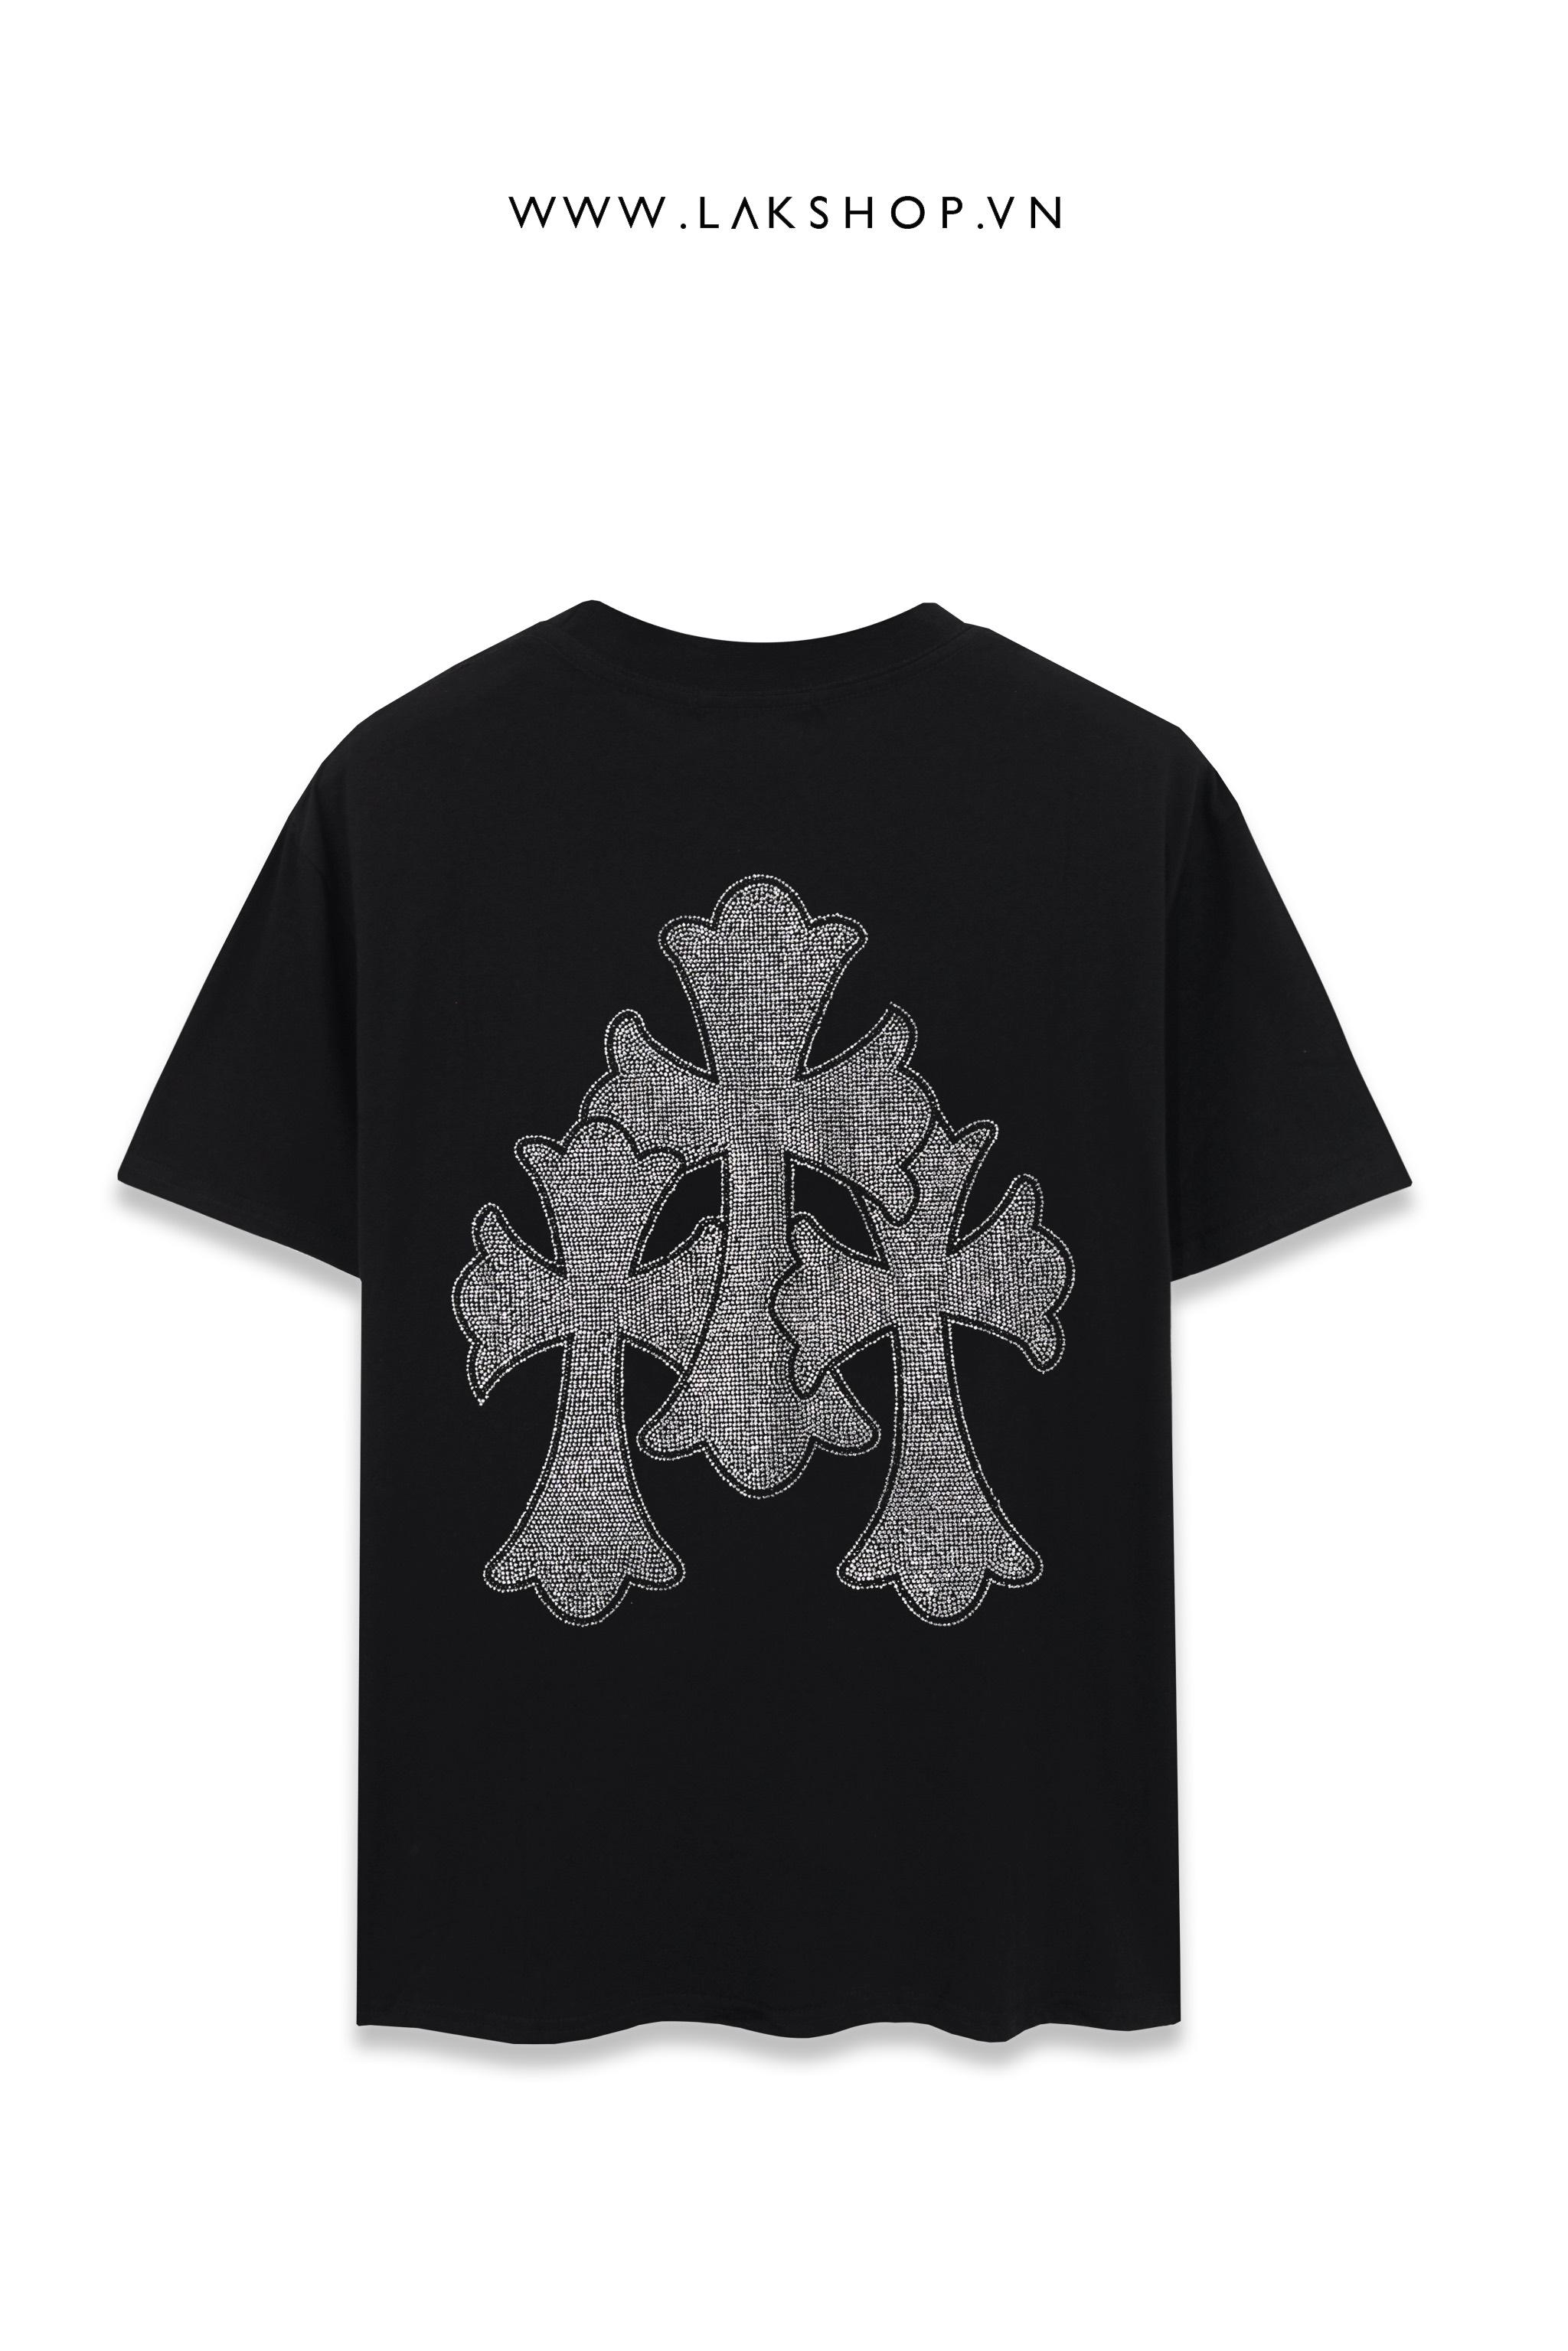 Black Effect With Neck Lanyard Shirt cv1